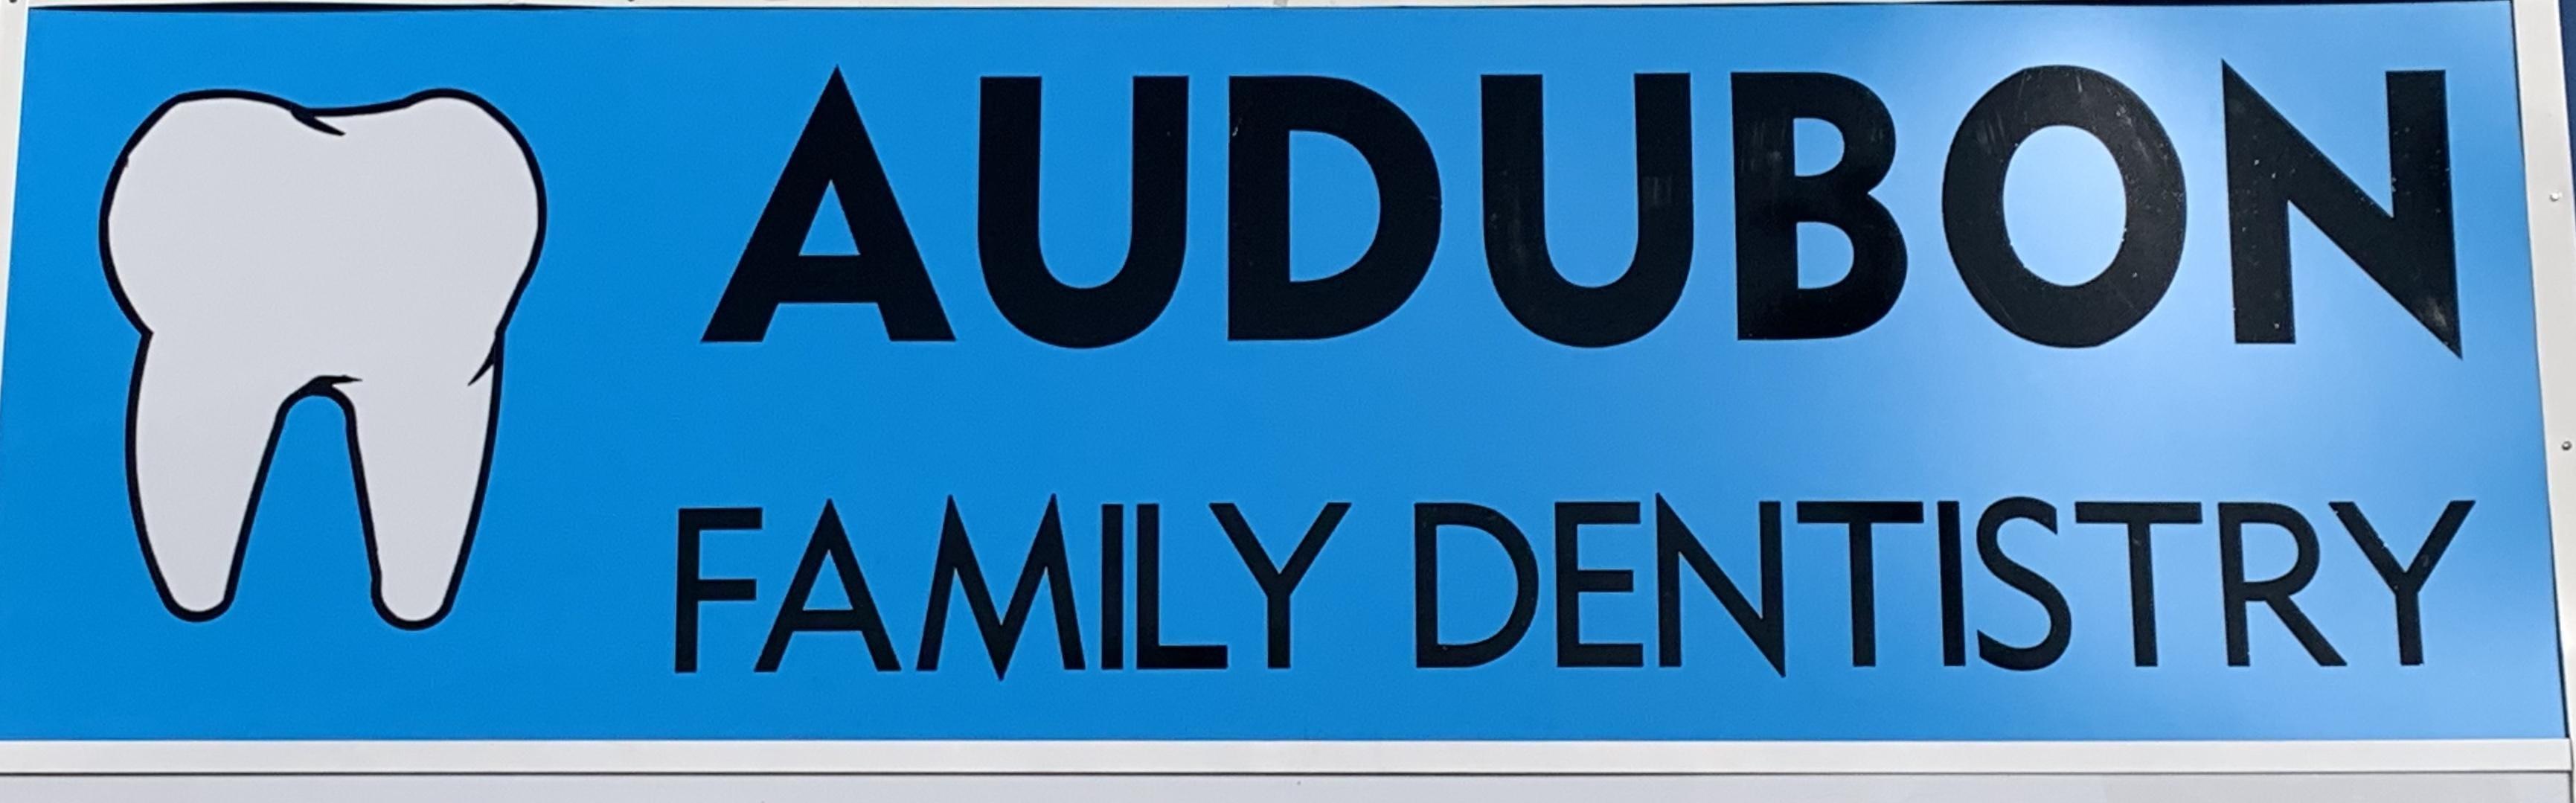 Audubon Family Dentistry Logo